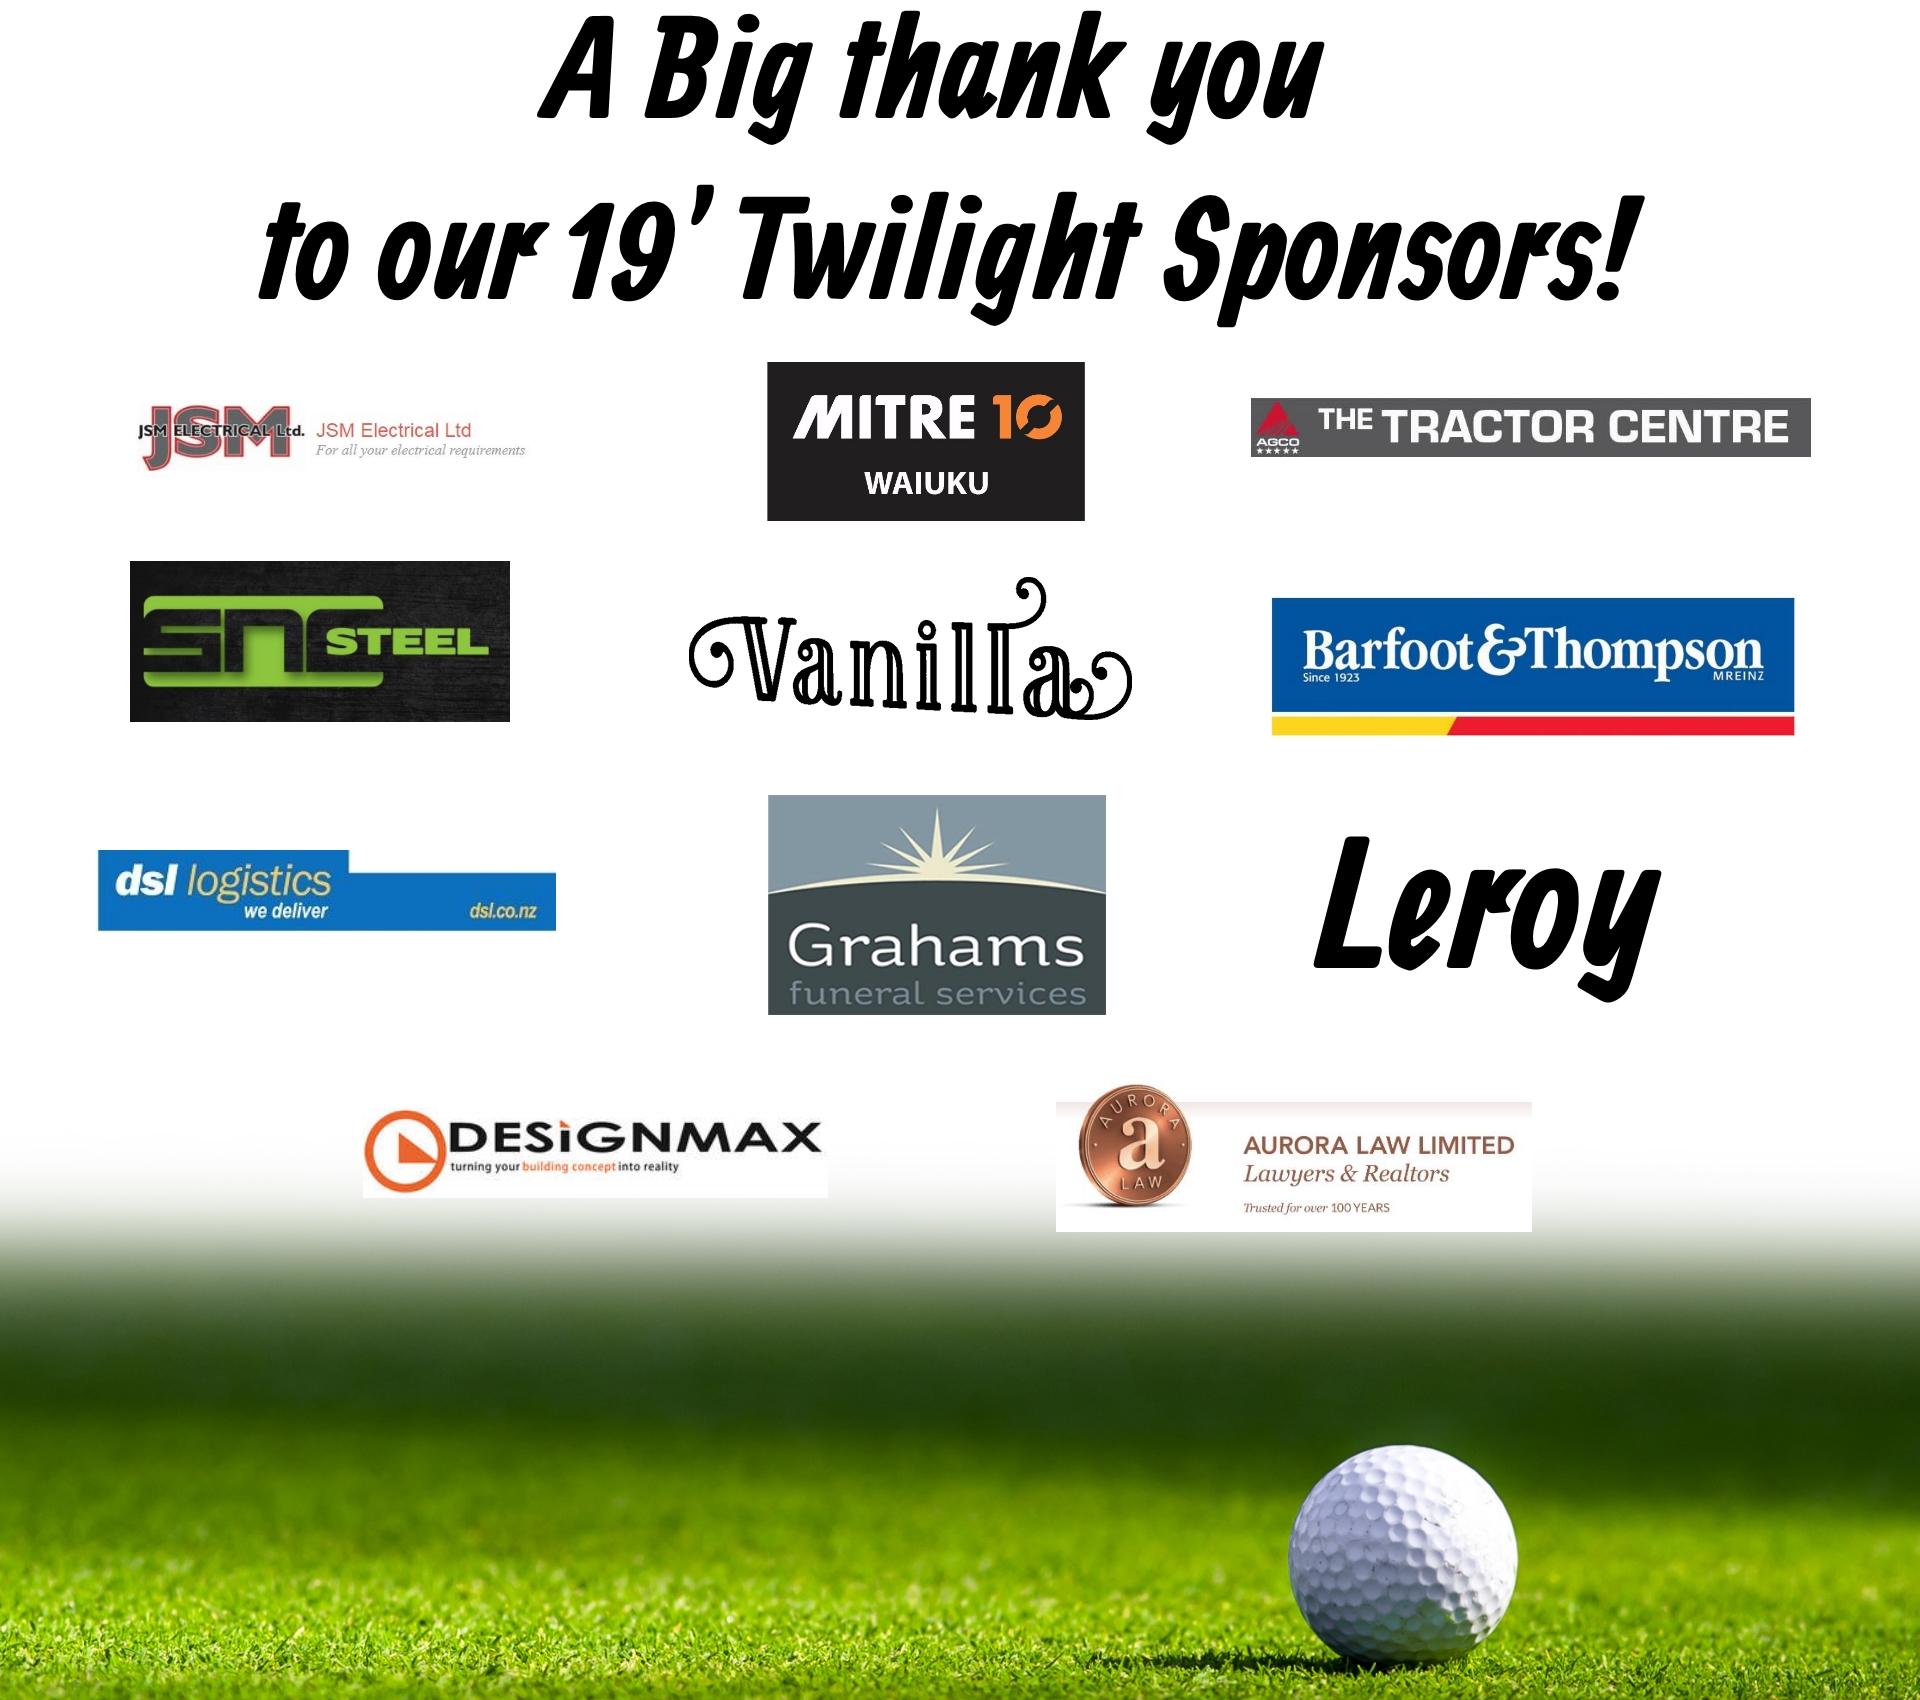 Twilight Sponsors Thank you.jpg